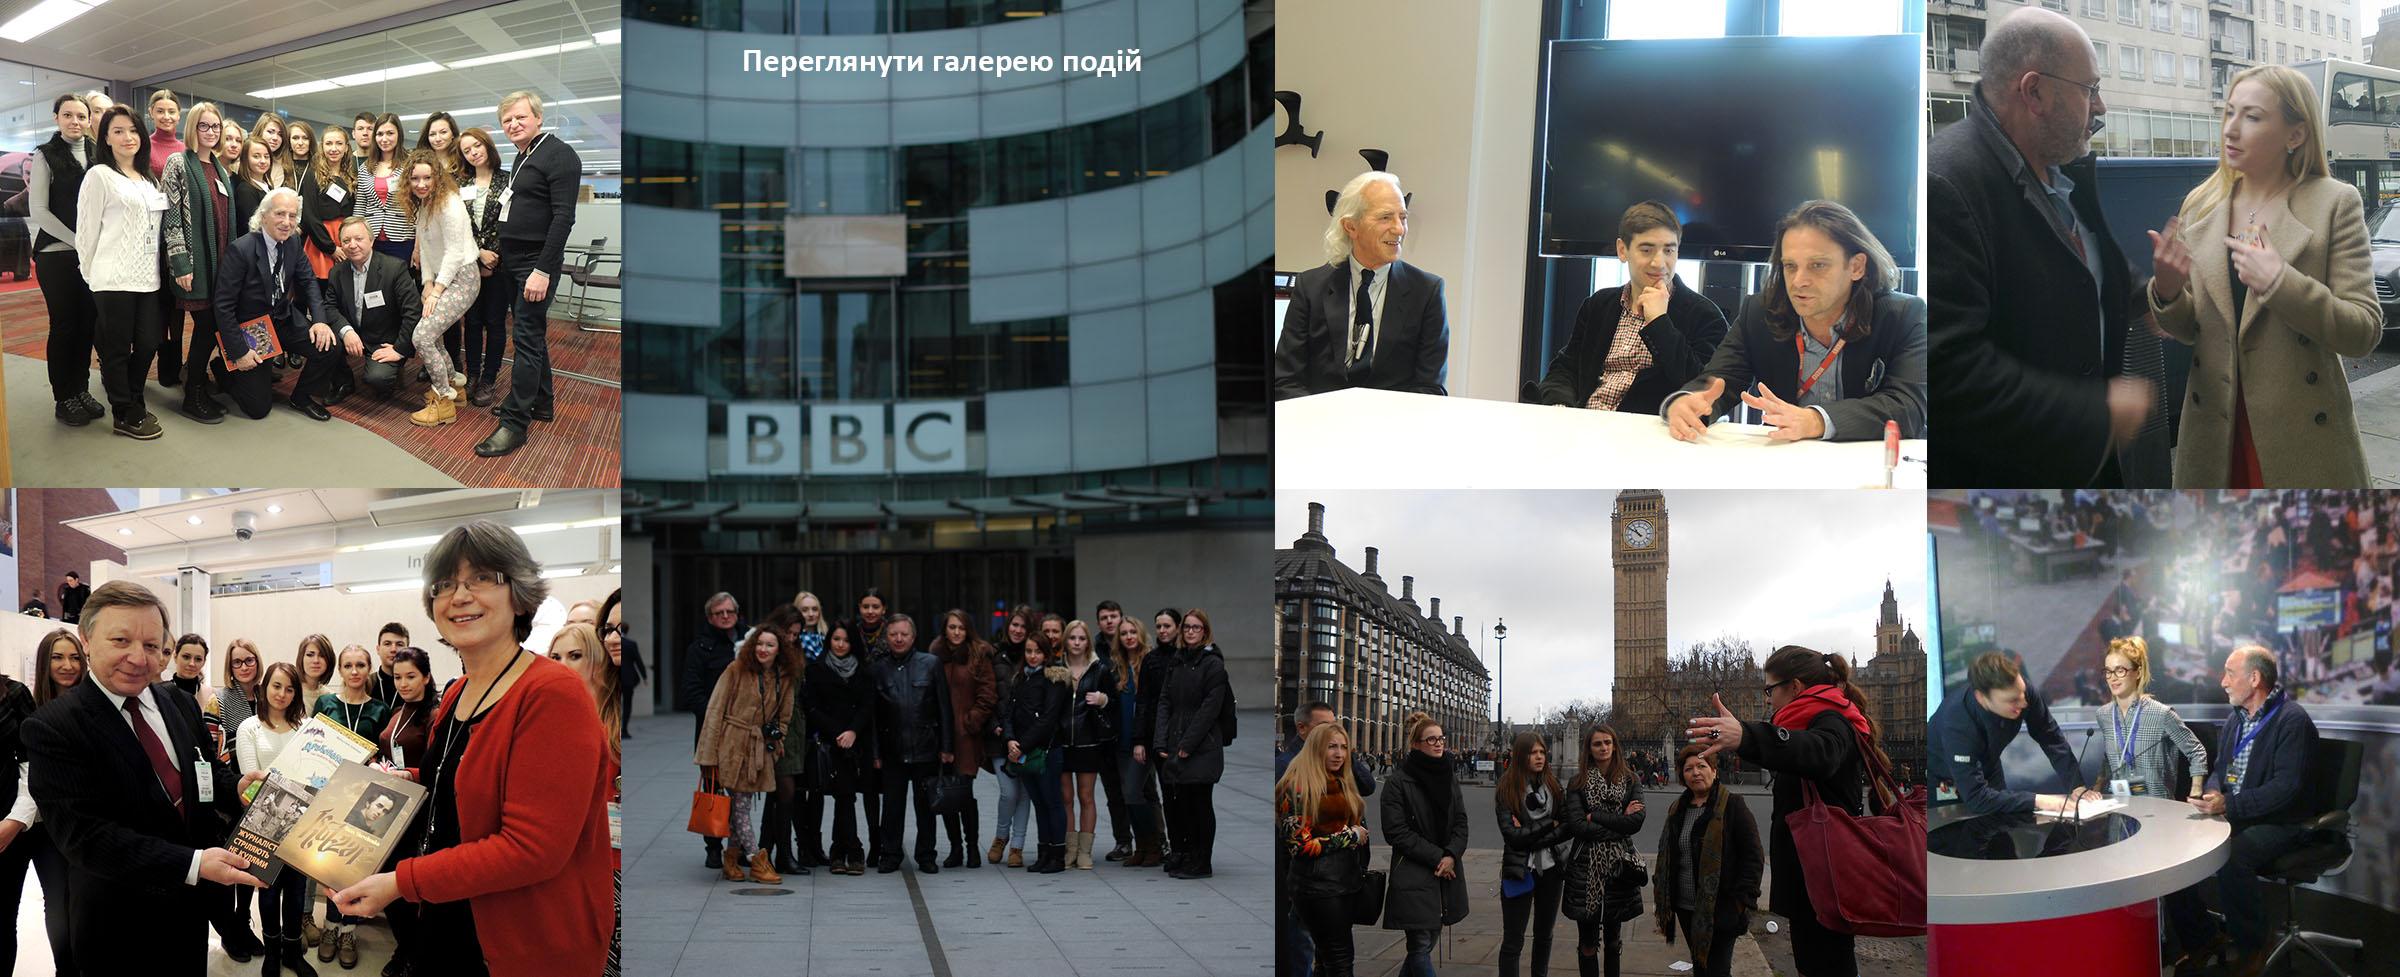 London education programs